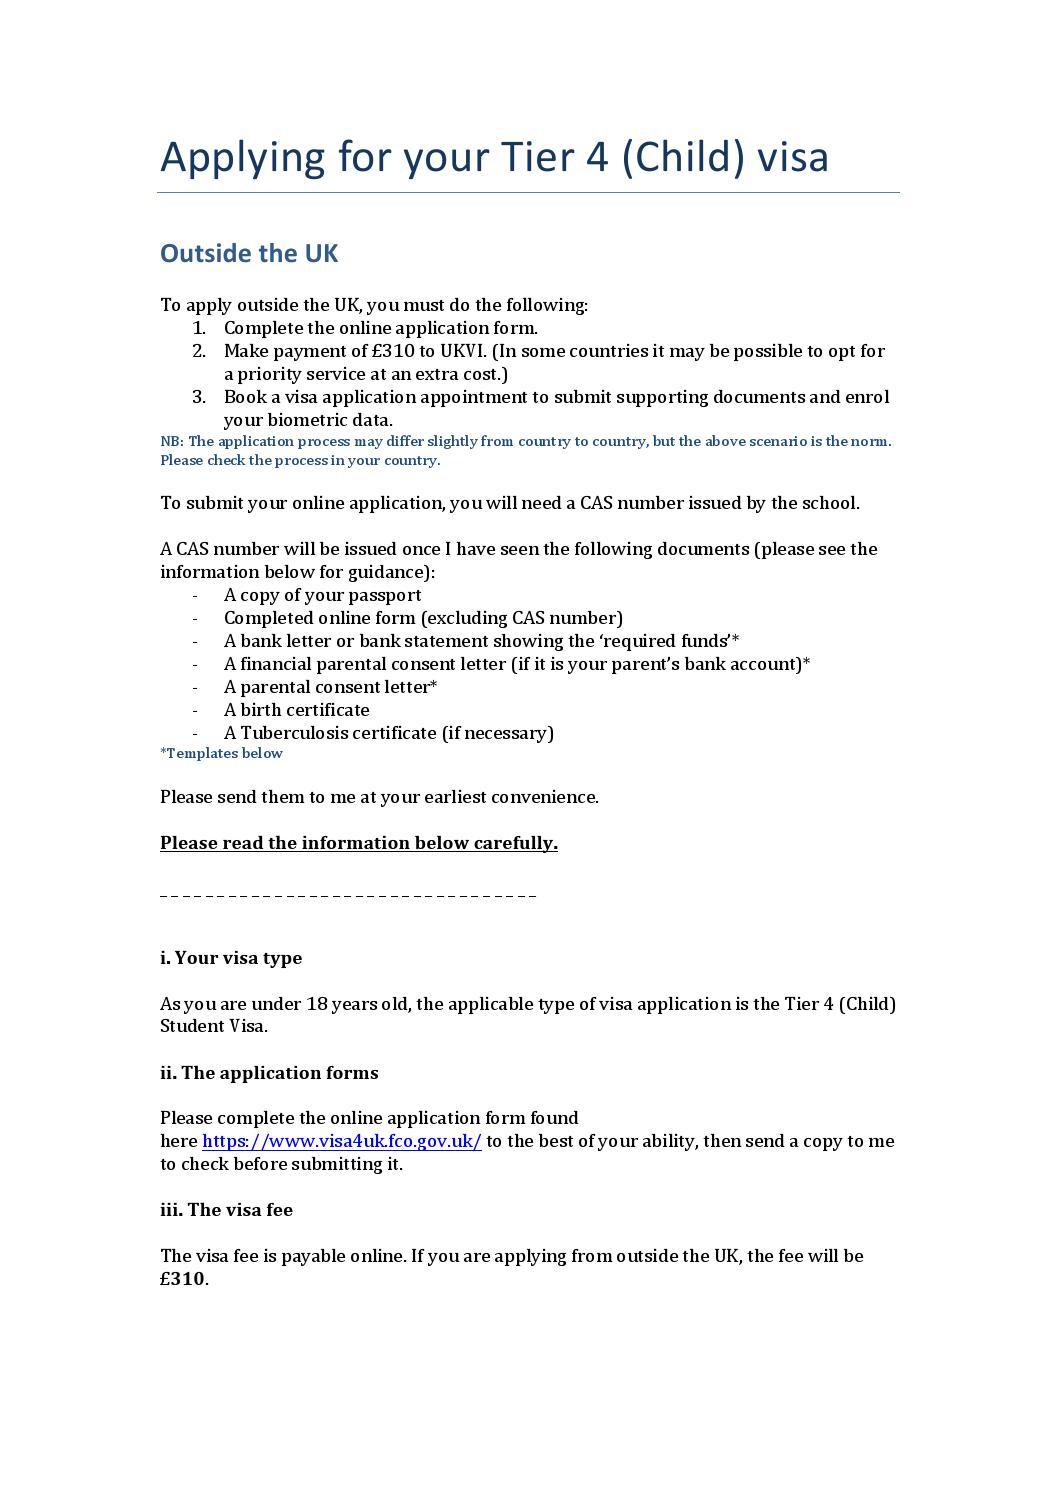 Visa guidance applying outside the uk child by fabio